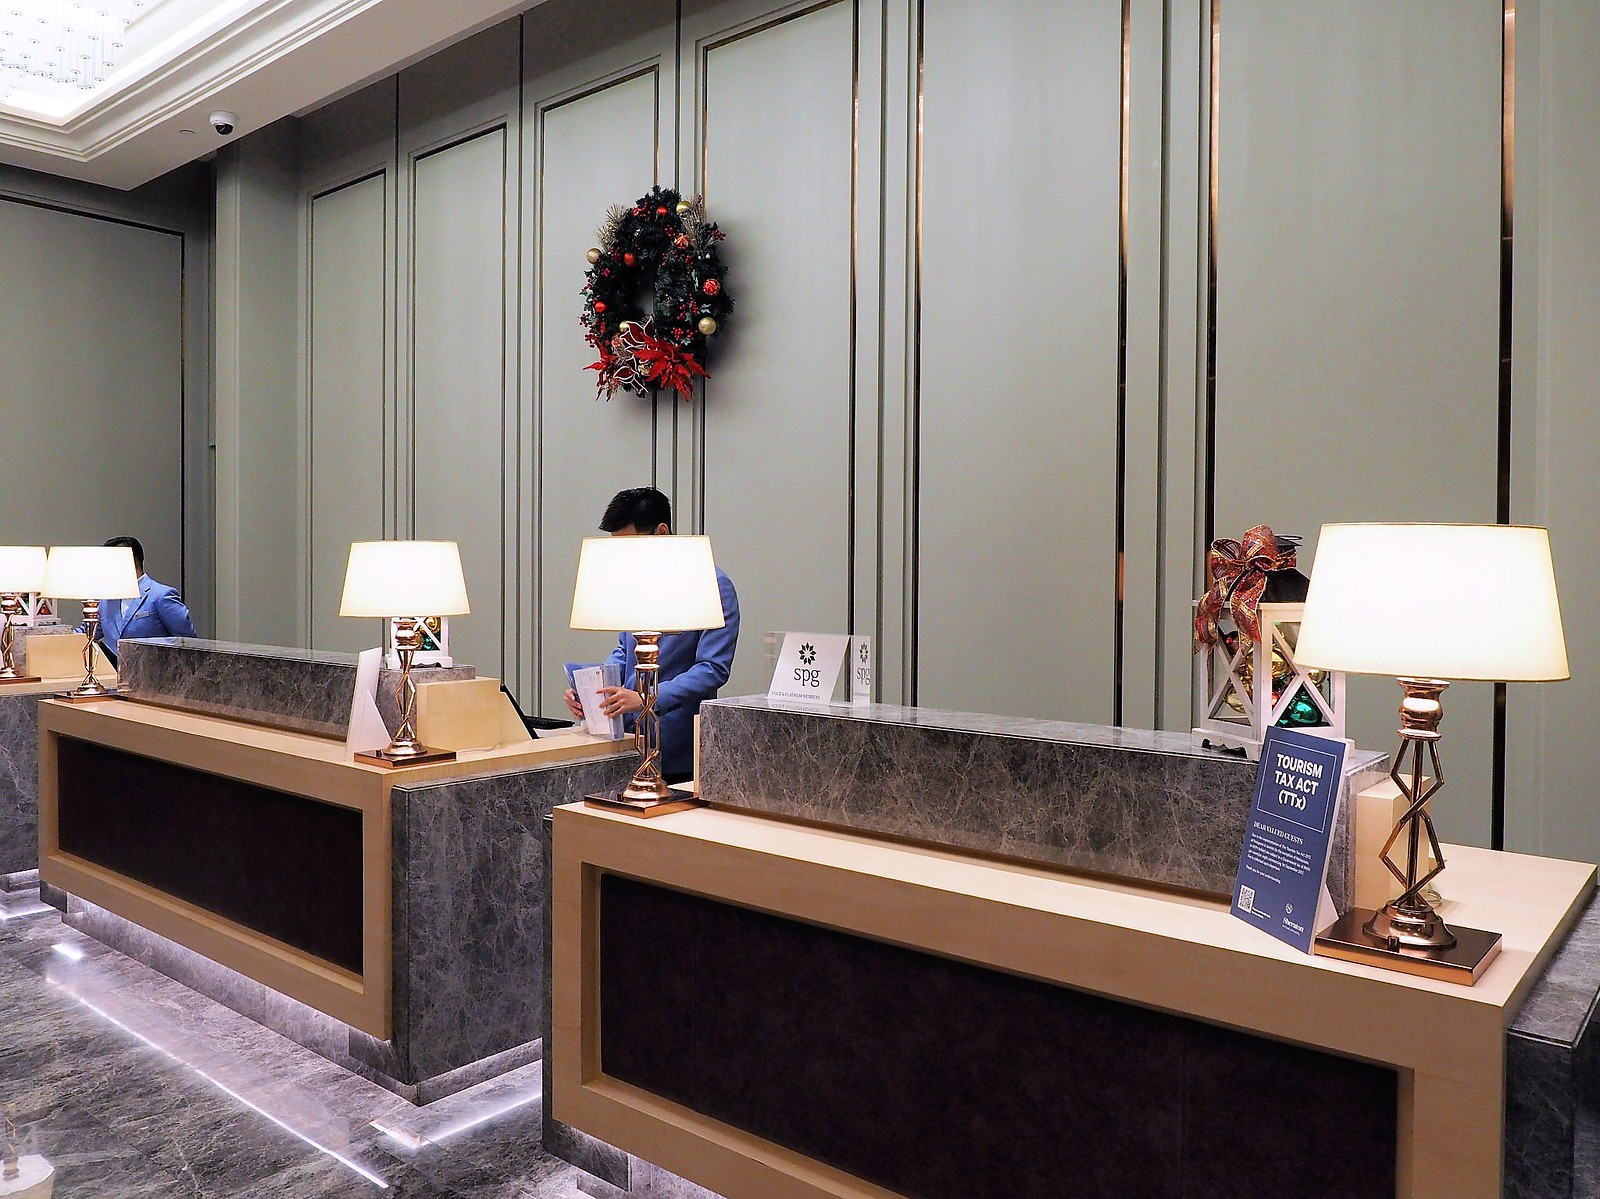 Lobby of Sheraton Petaling Jaya Hotel